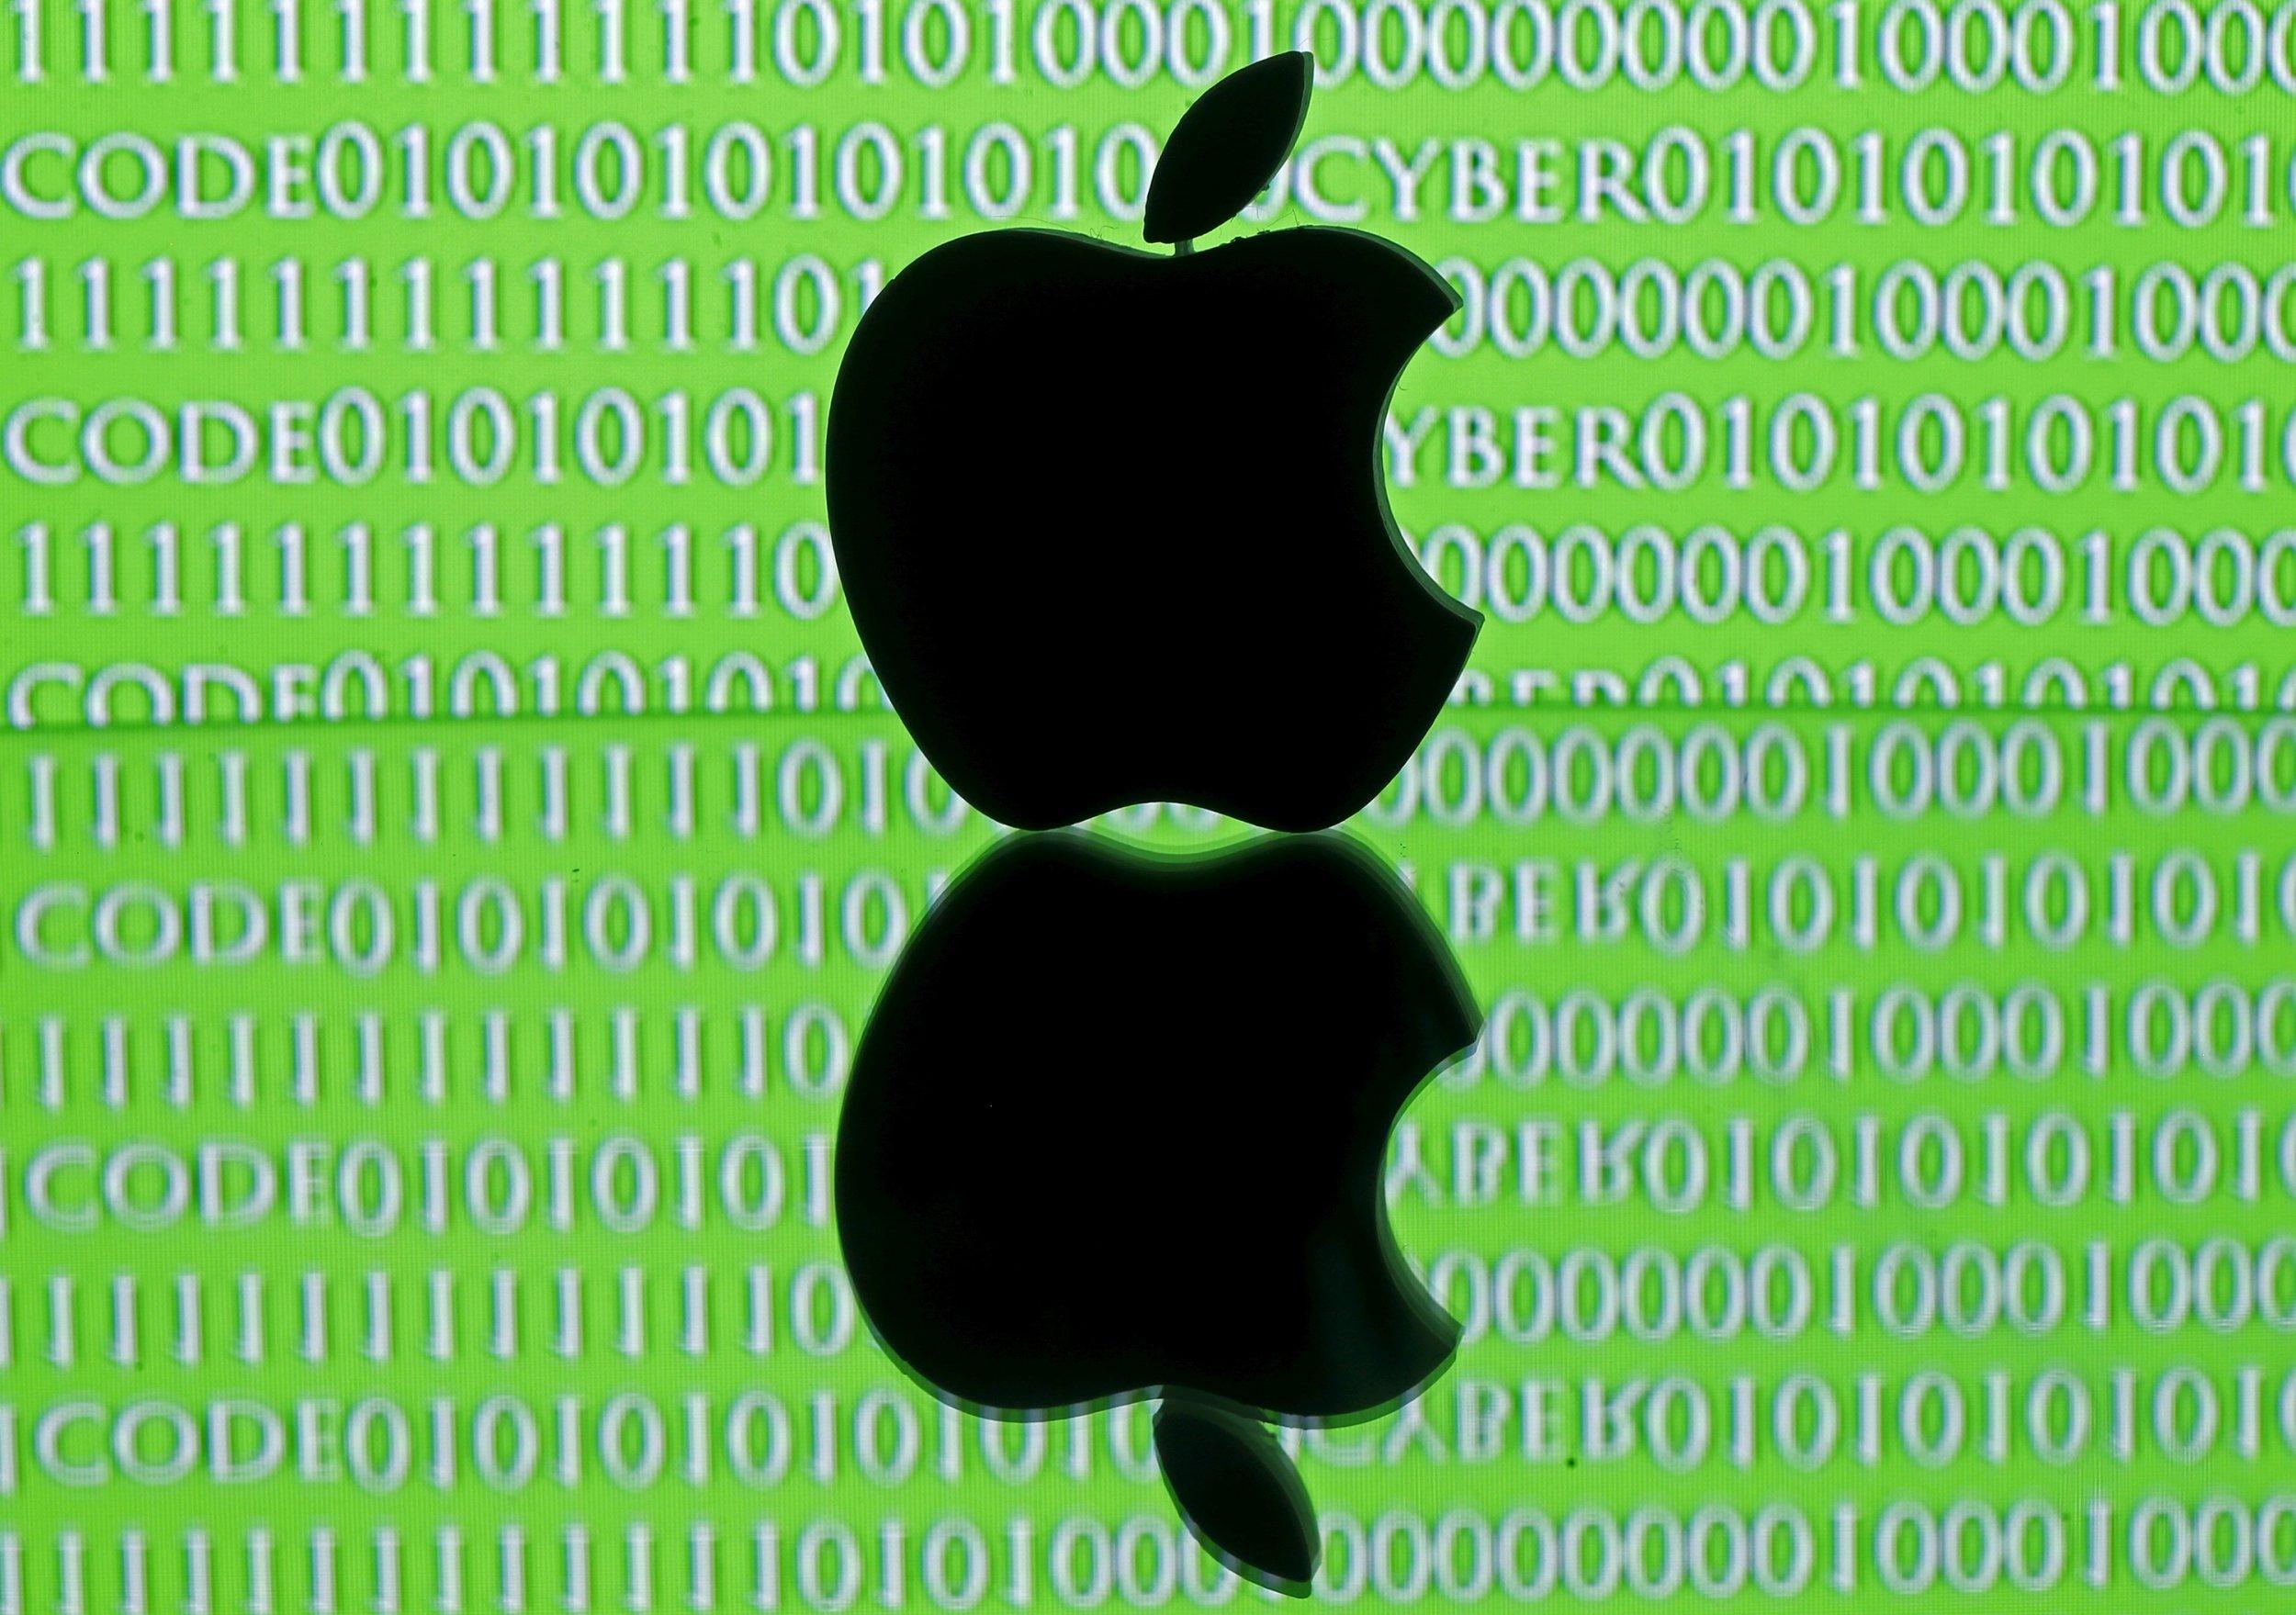 Apple iphone san bernardino cellebrite israel encryption